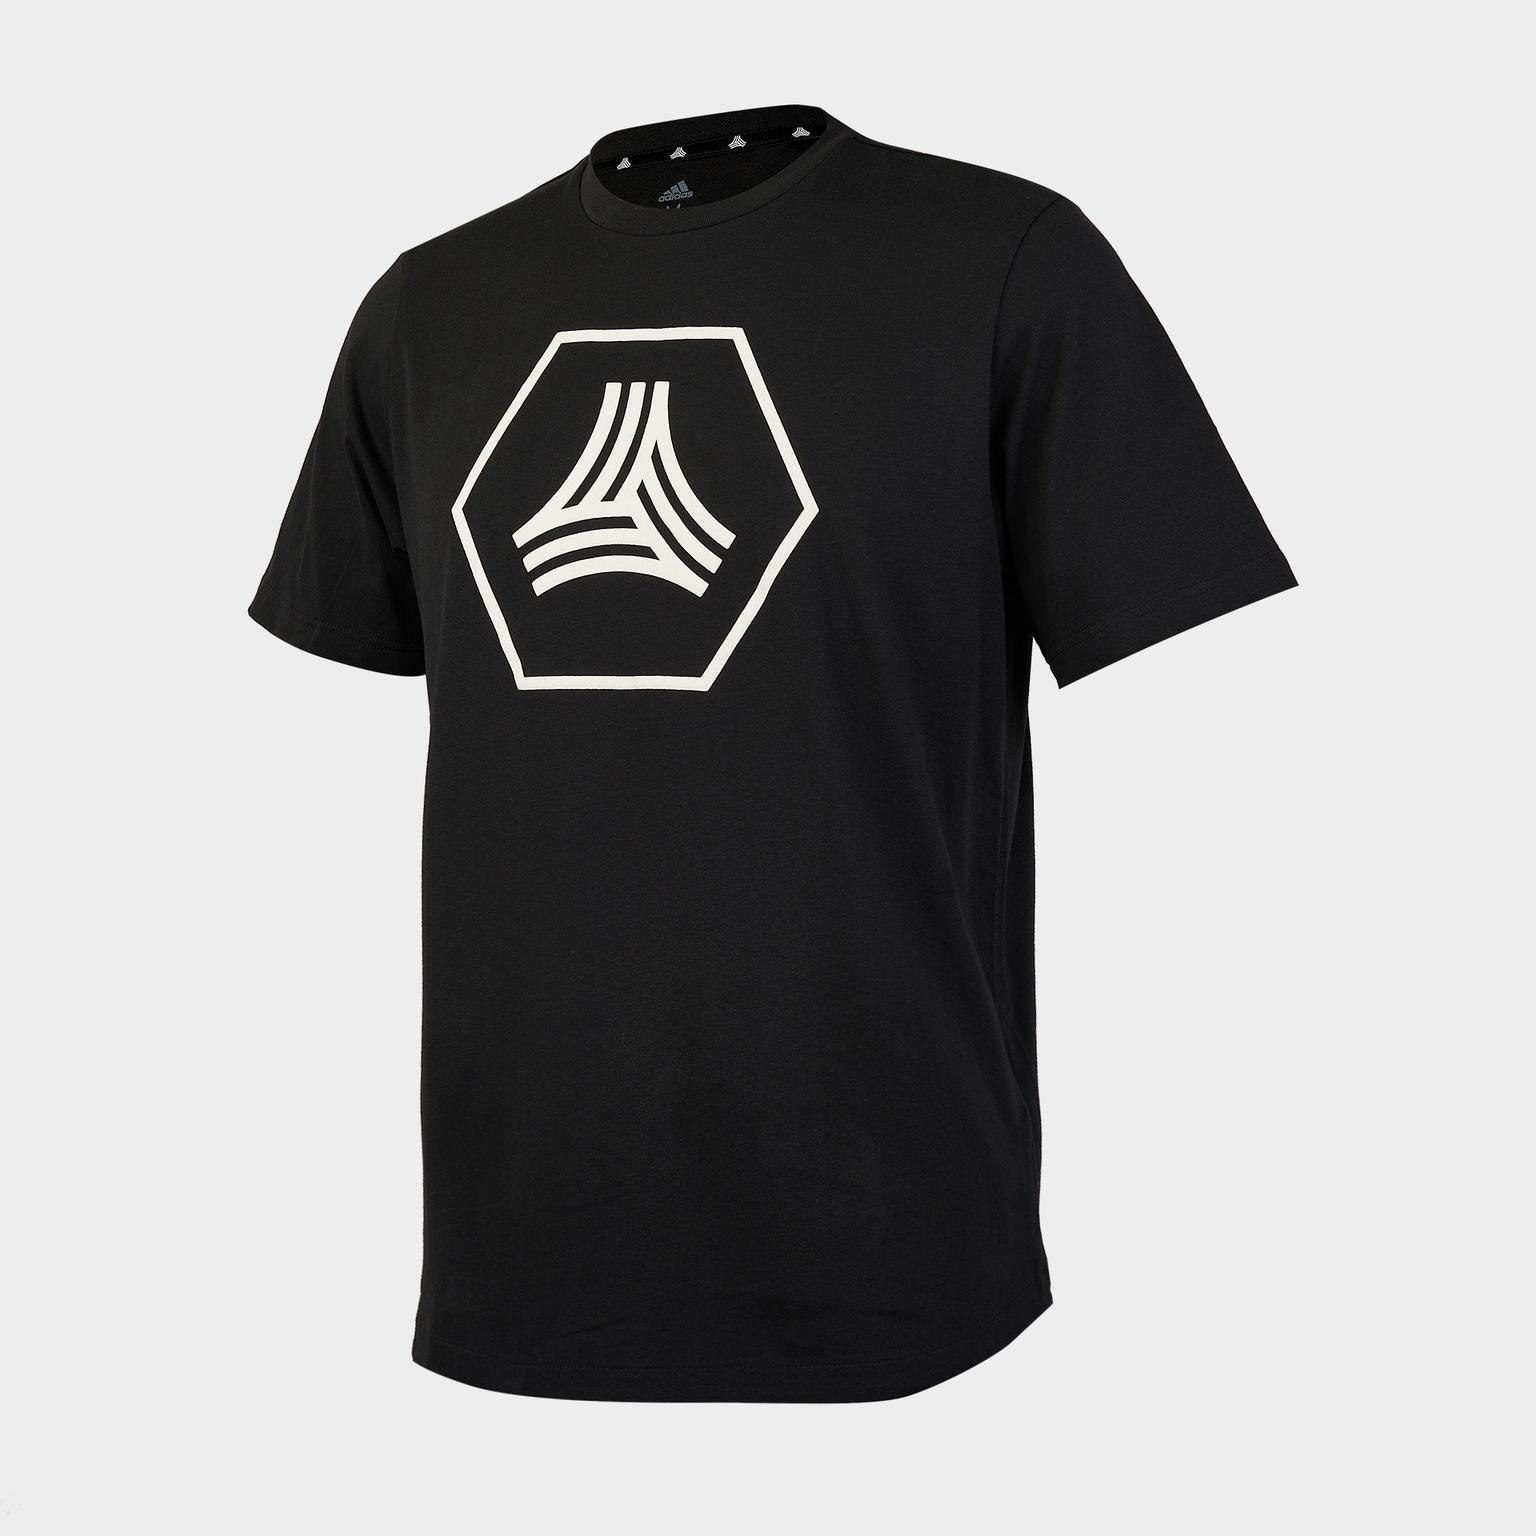 Футболка хлопковая Adidas Tan Logo Tee GE5179 футболка для мальчика adidas yb tr brand tee цвет белый dj1151 размер 134